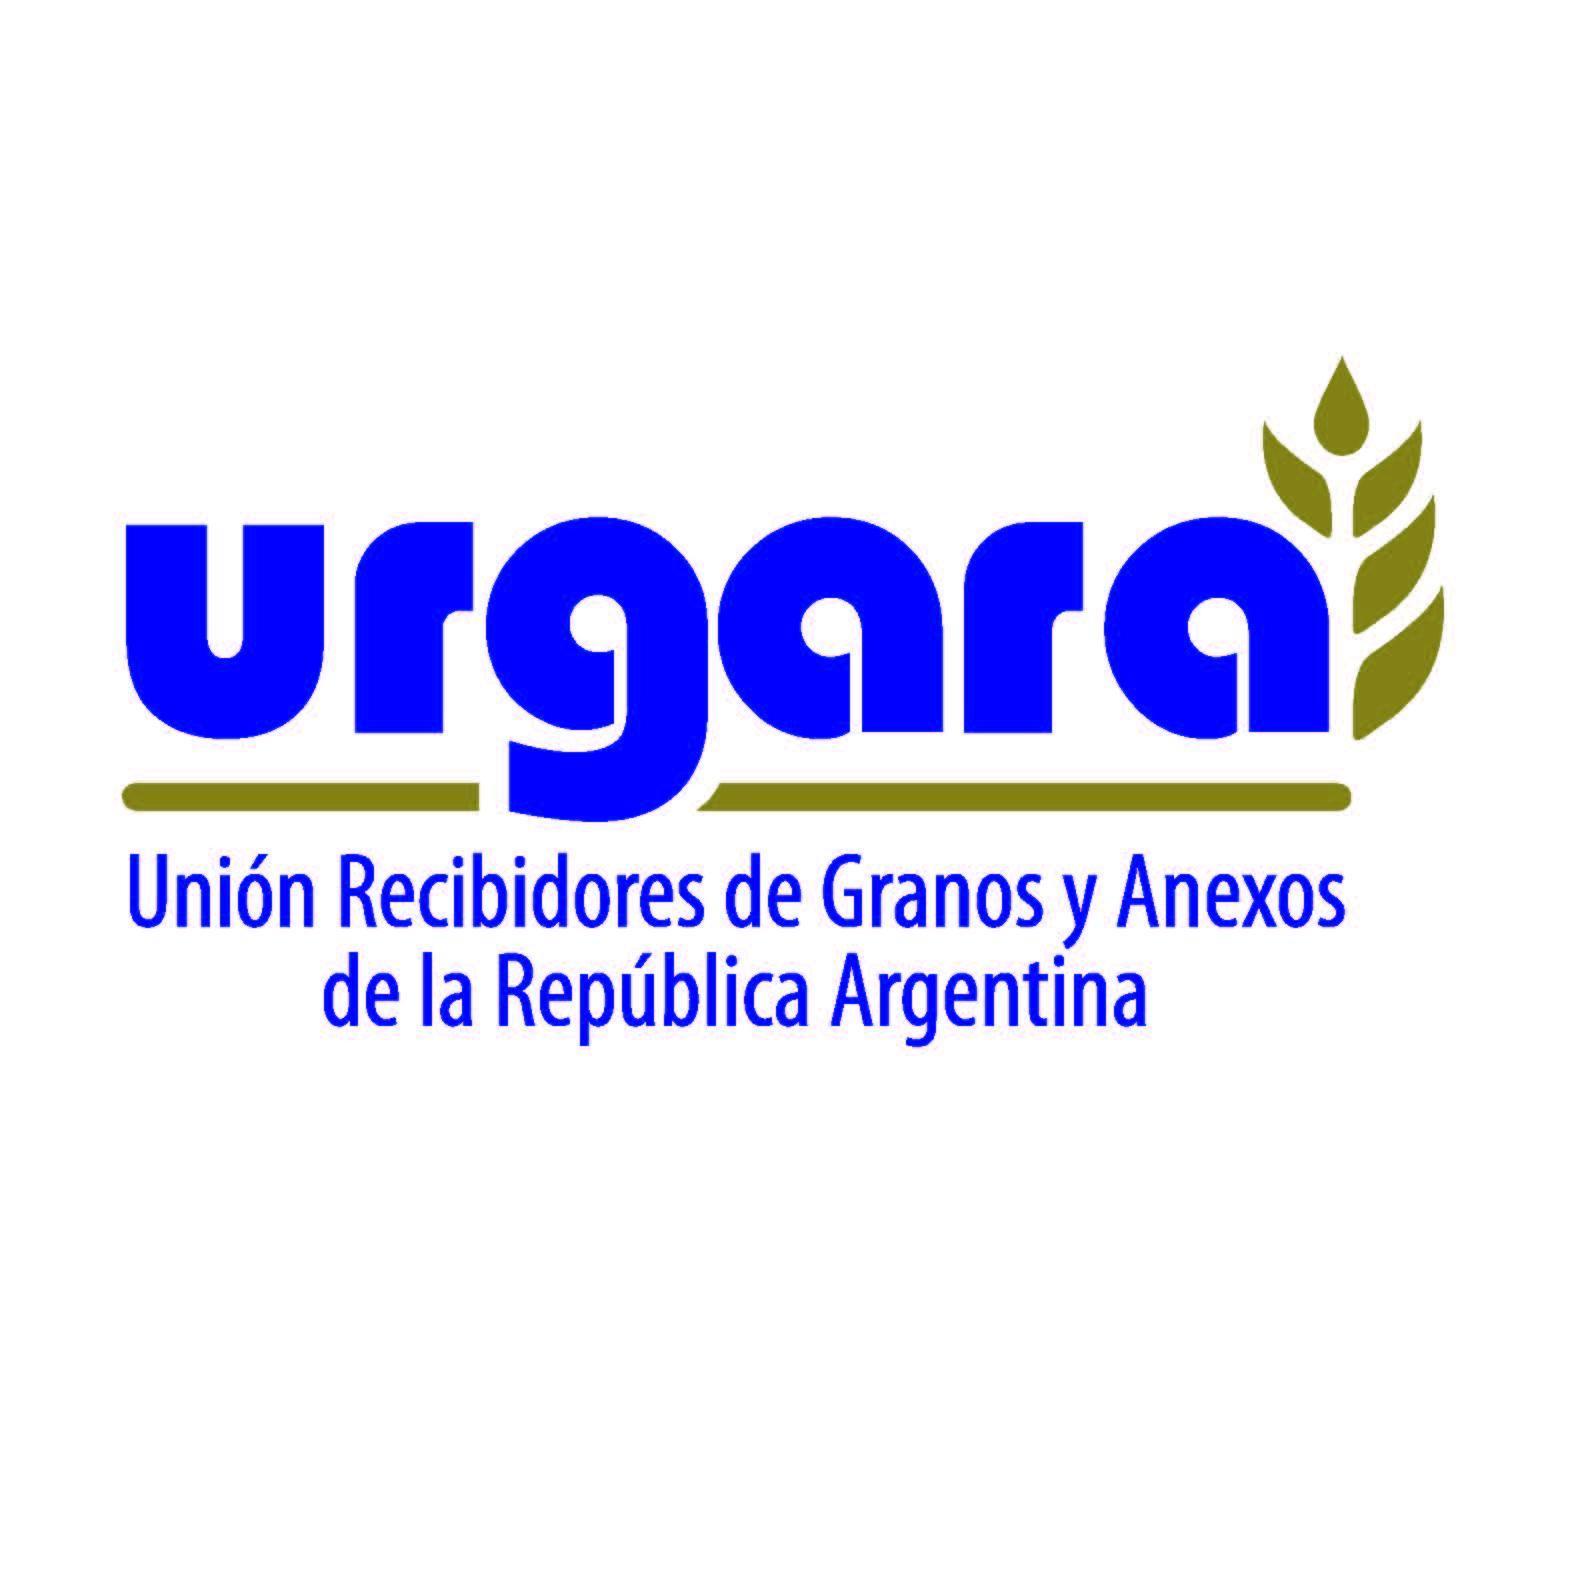 URGARA